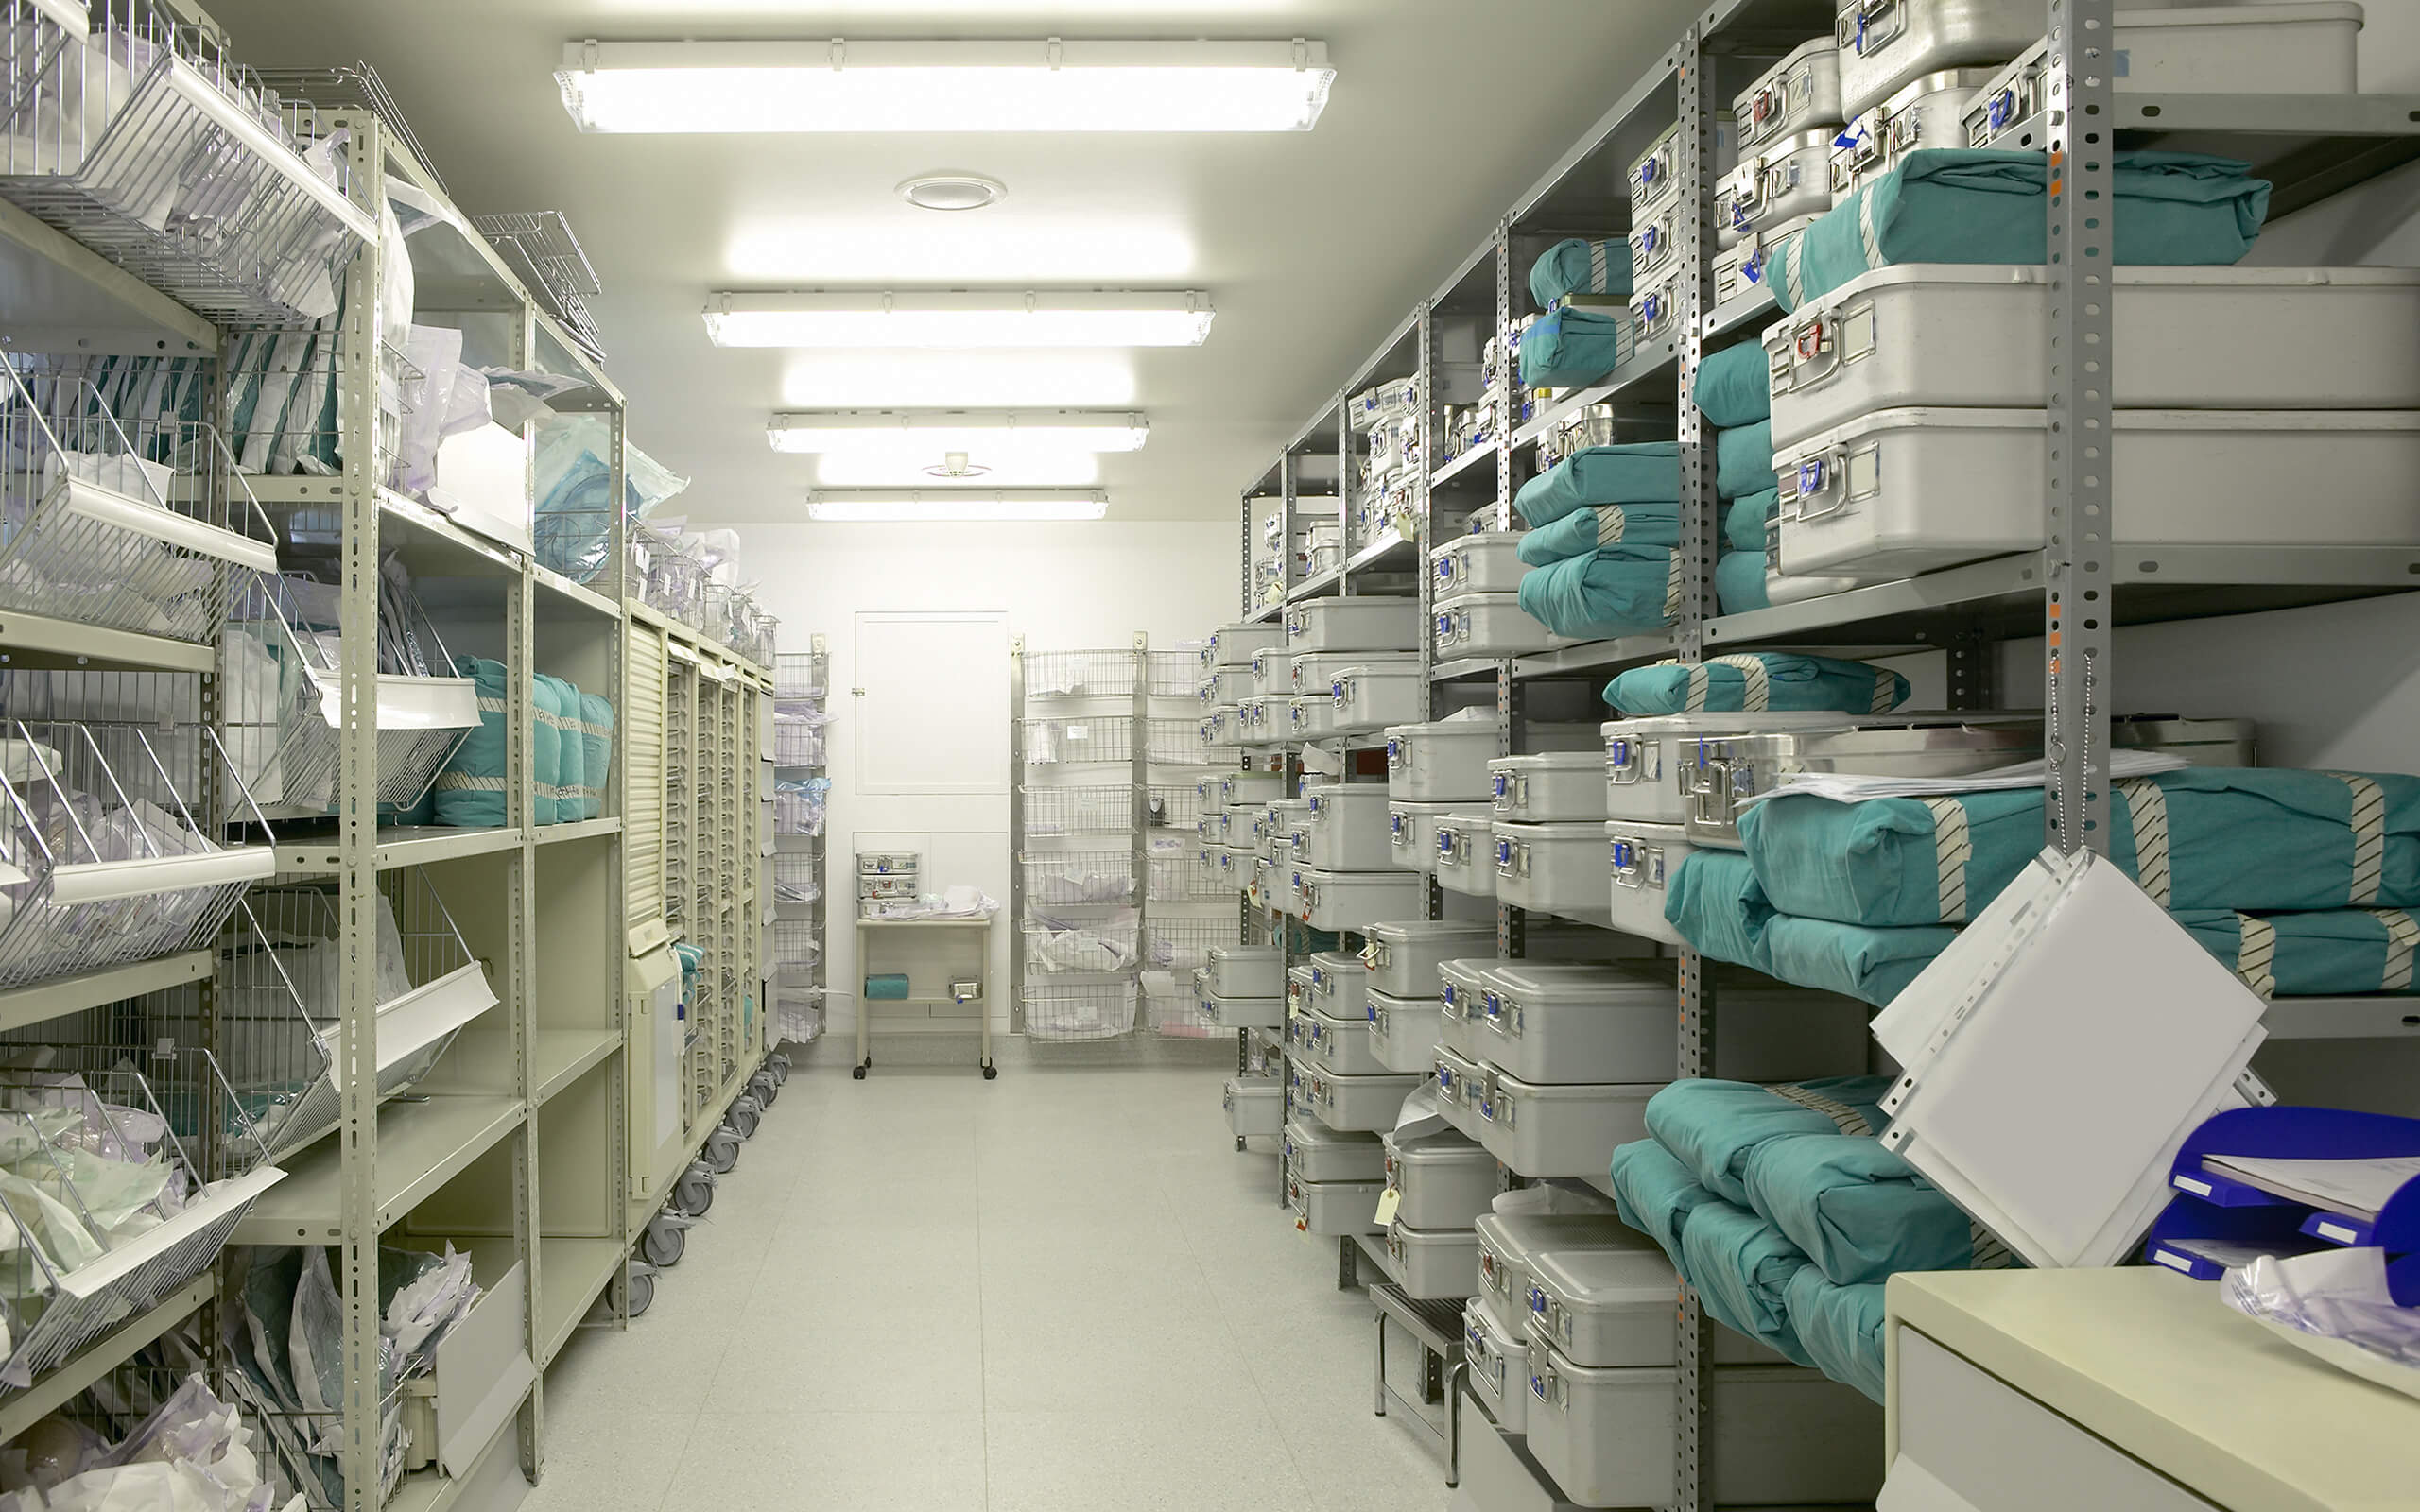 a hospital store room